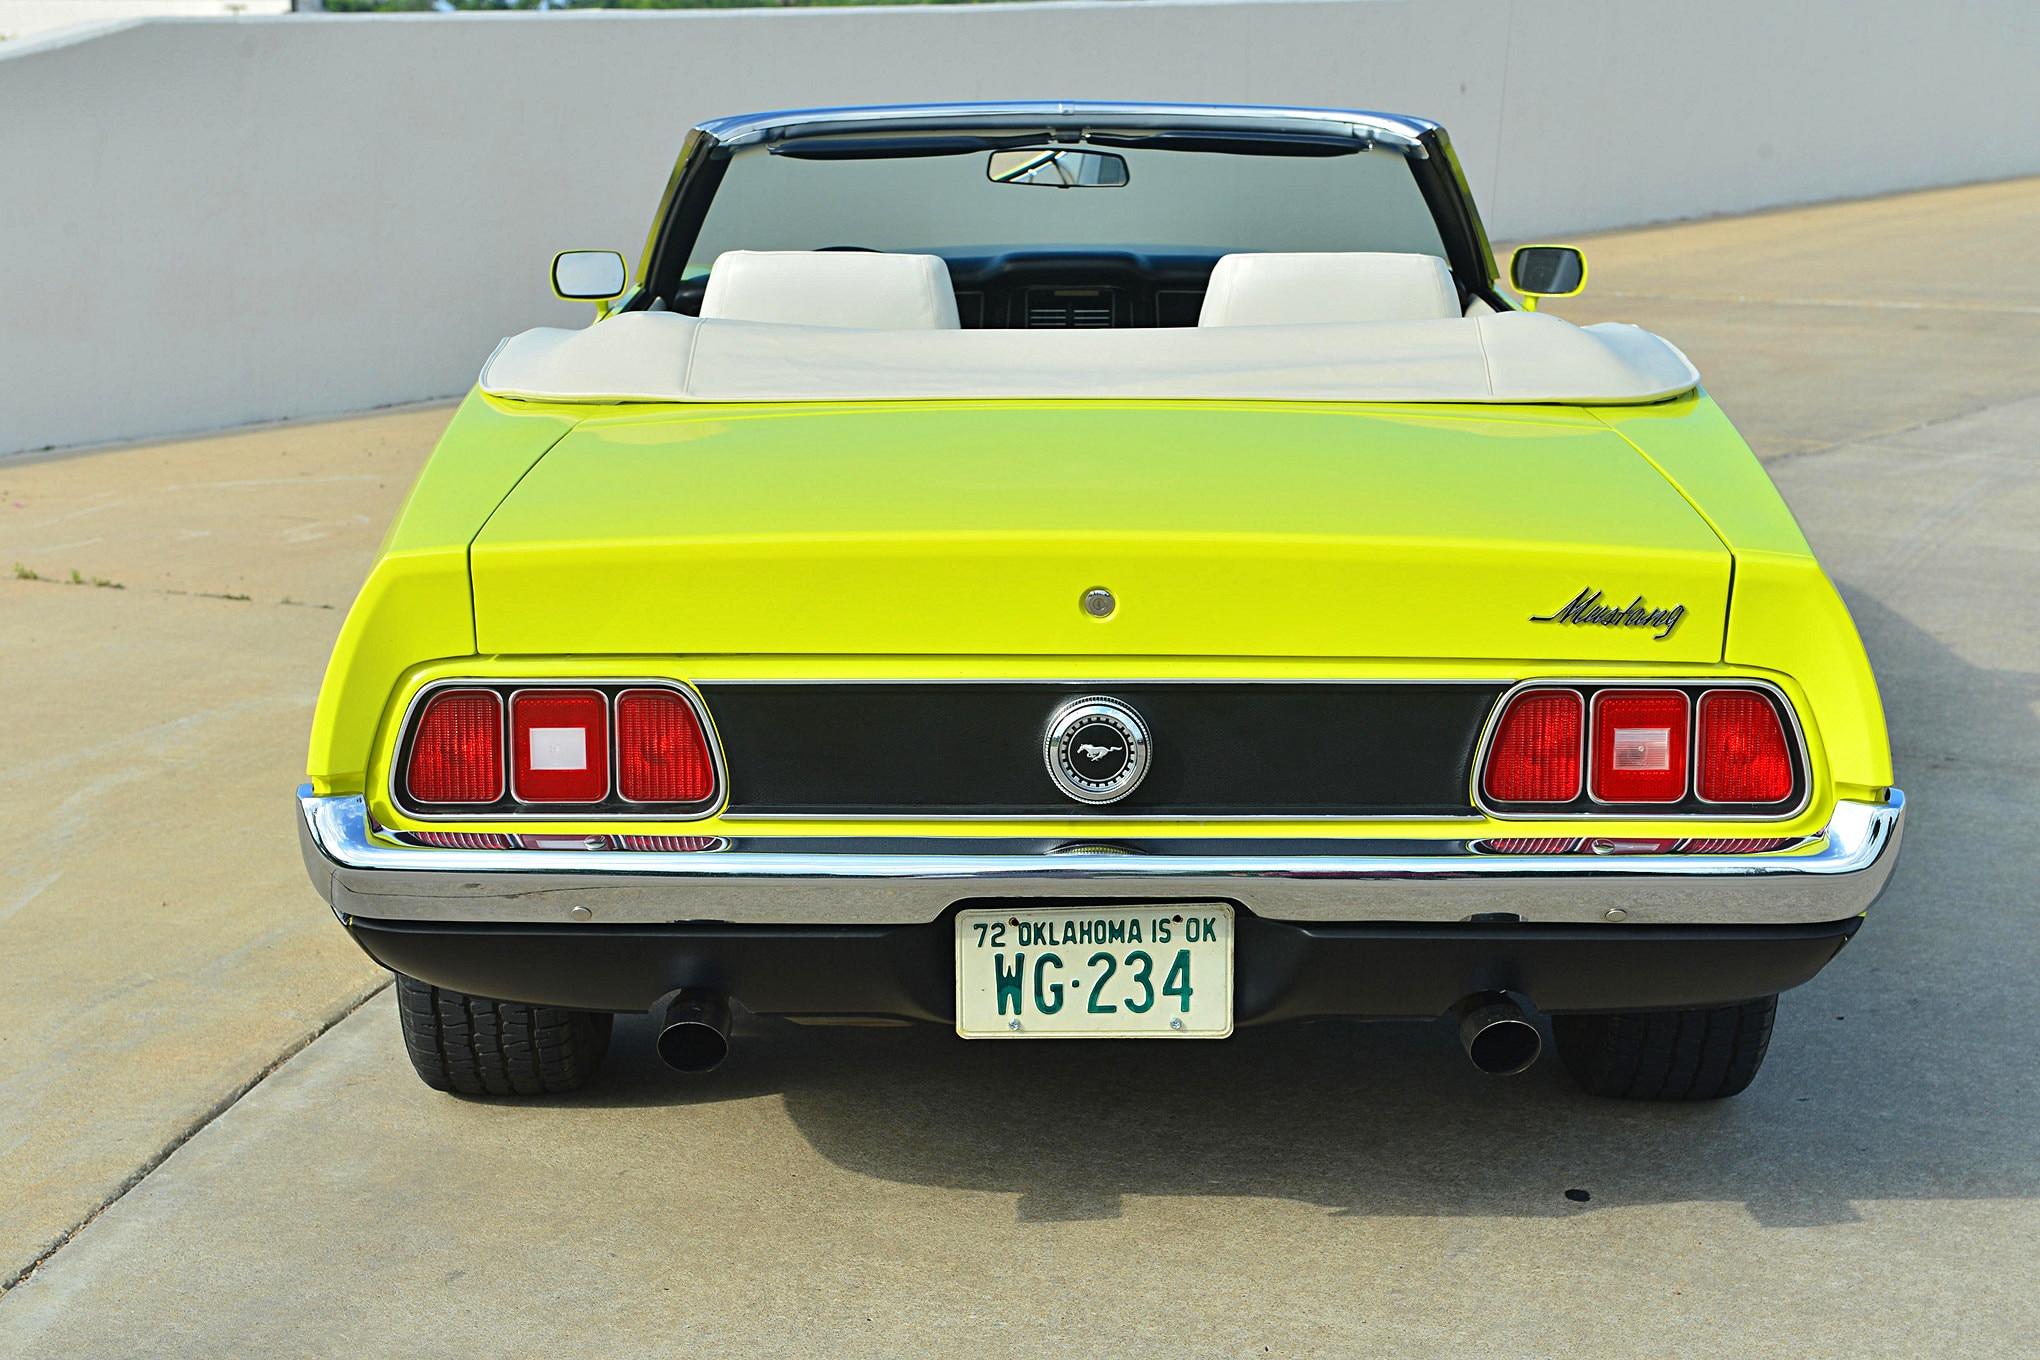 016 1971 73 Mustang SpottersGuide Heasley